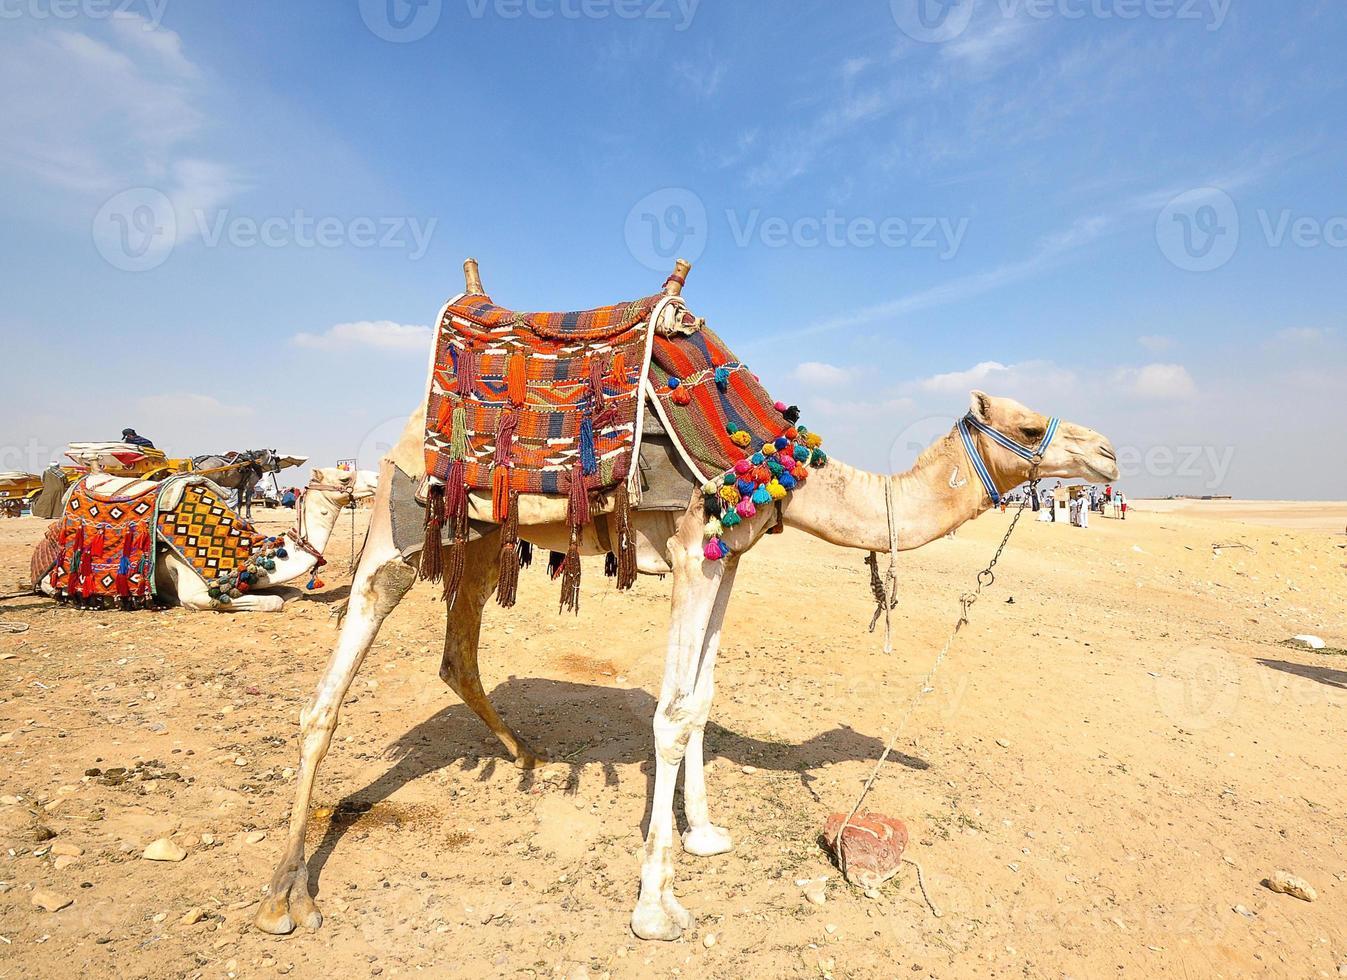 kameel op woestijn foto